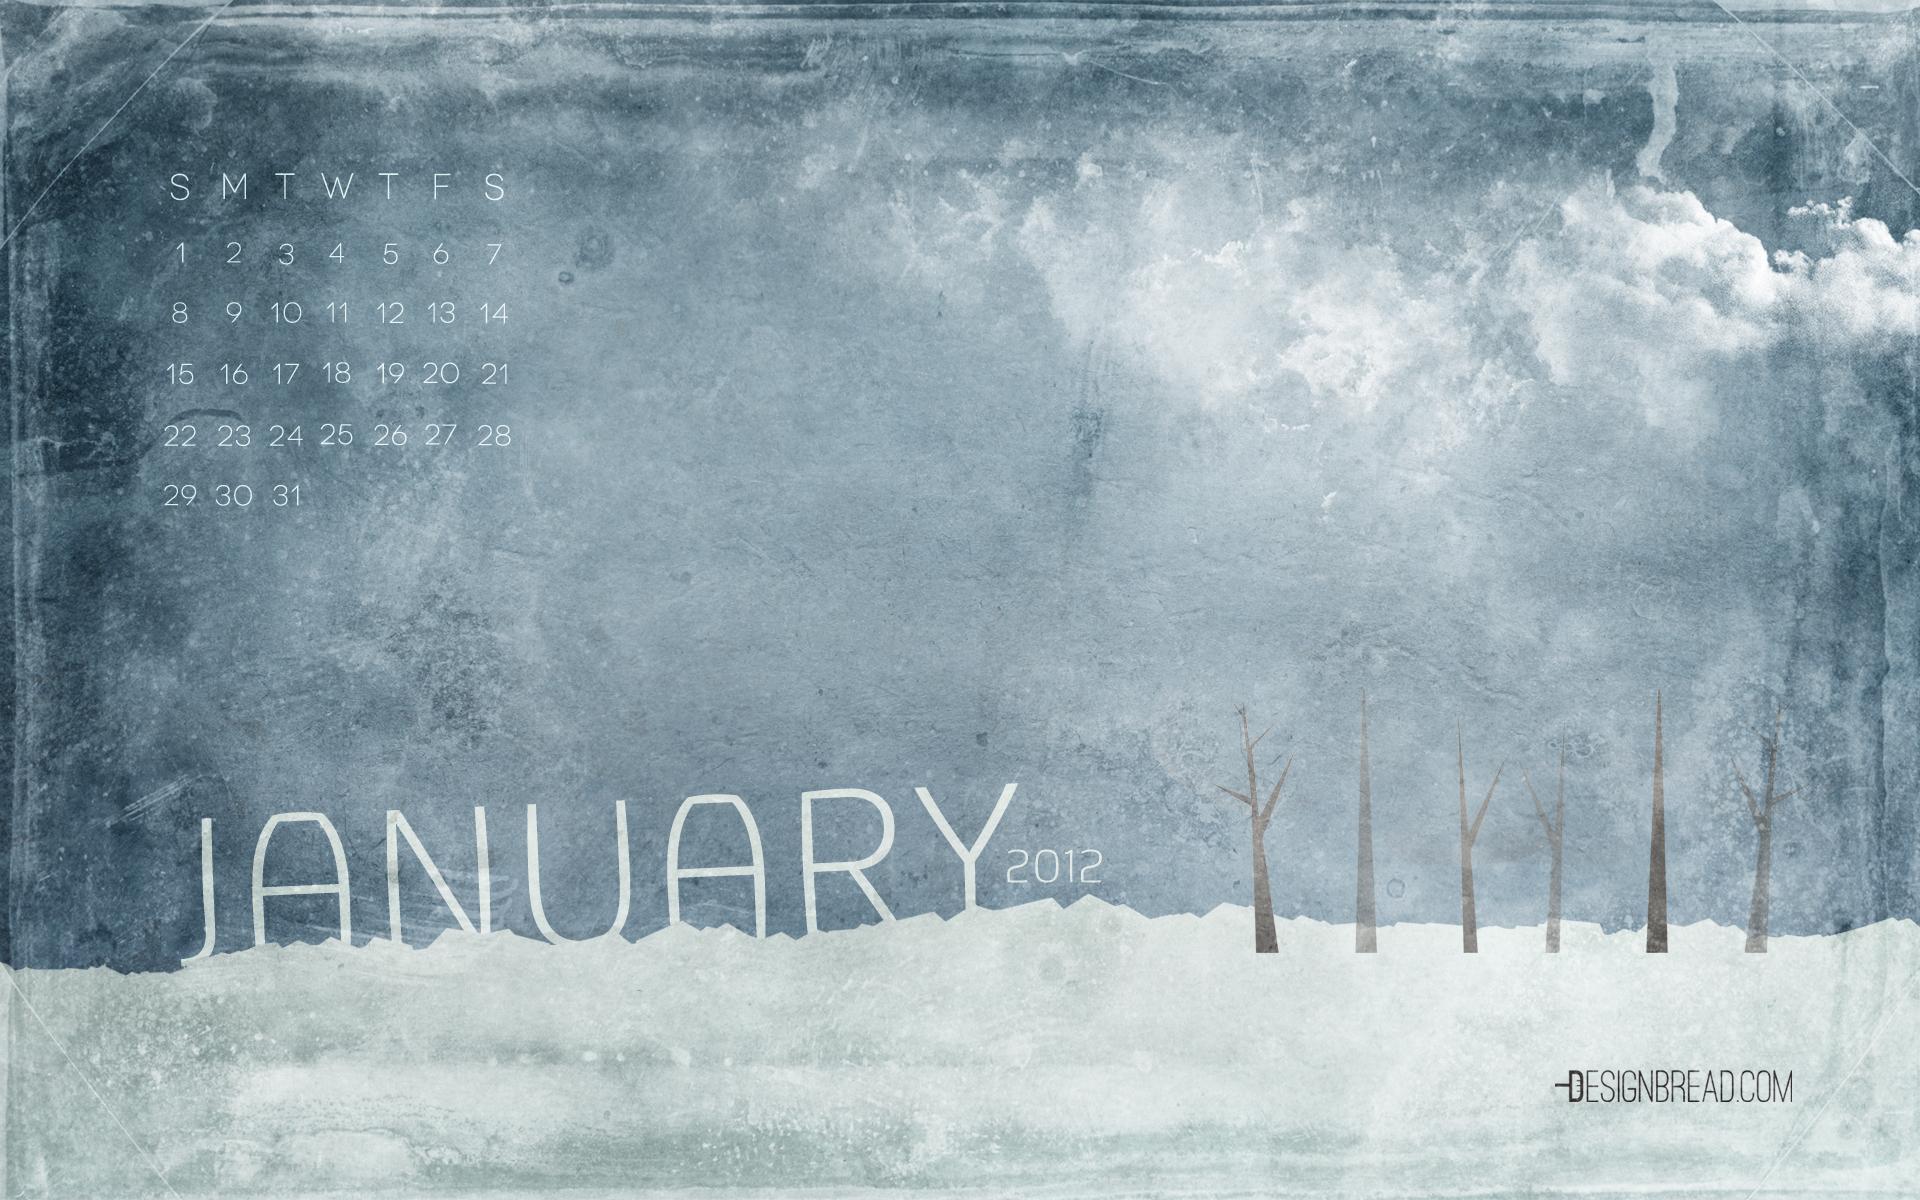 January 2012 Calendar Wallpaper Design Bread 1920x1200